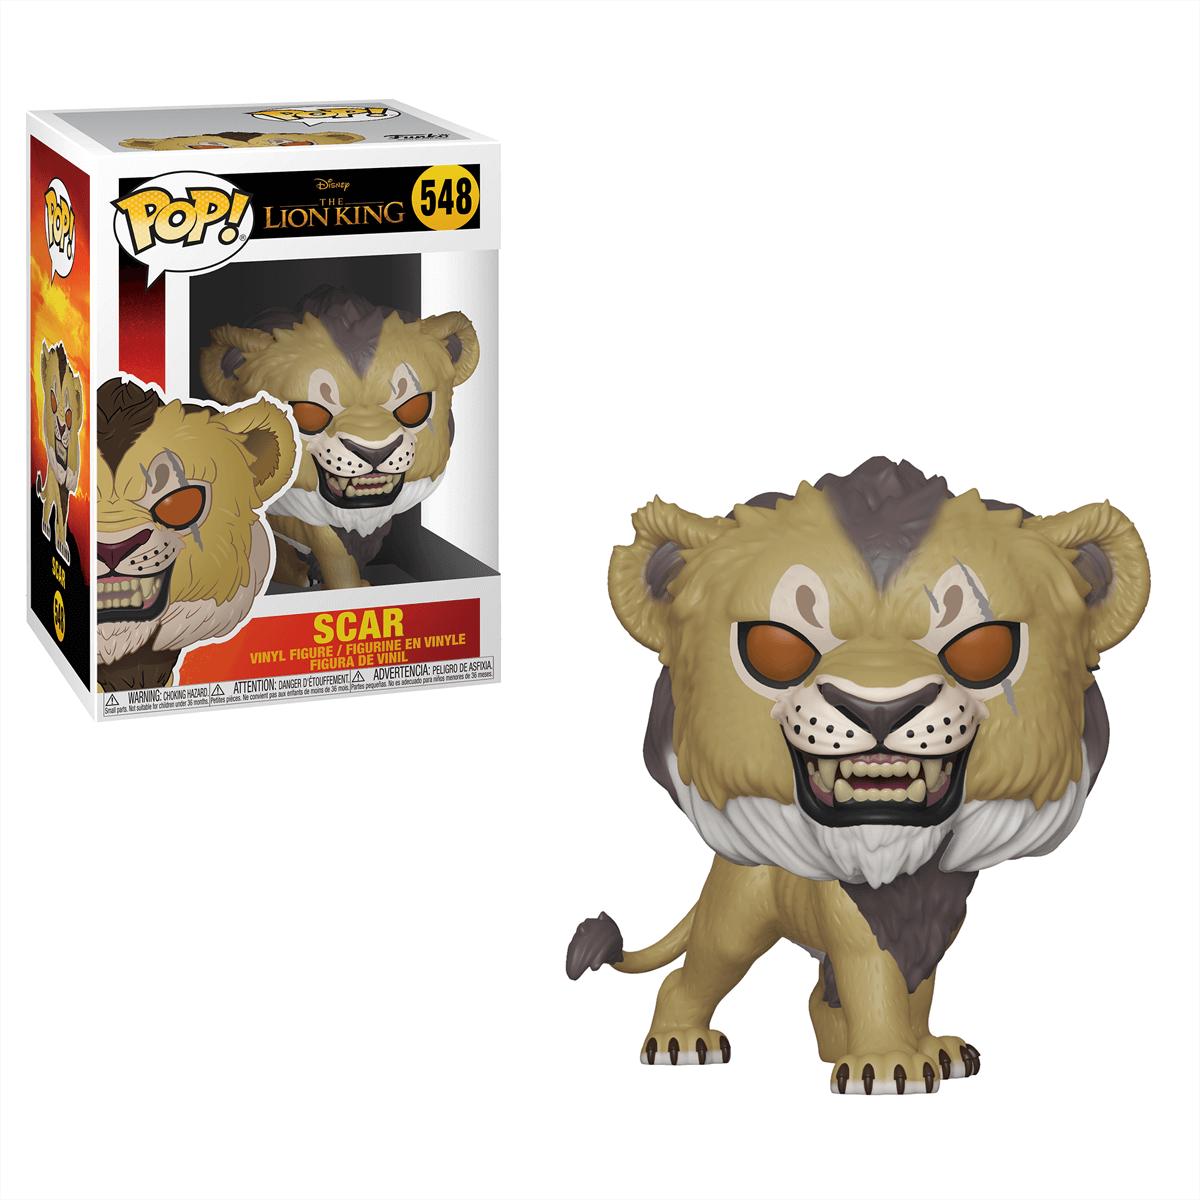 Funko Pop Disney Lion King 2019 Scar